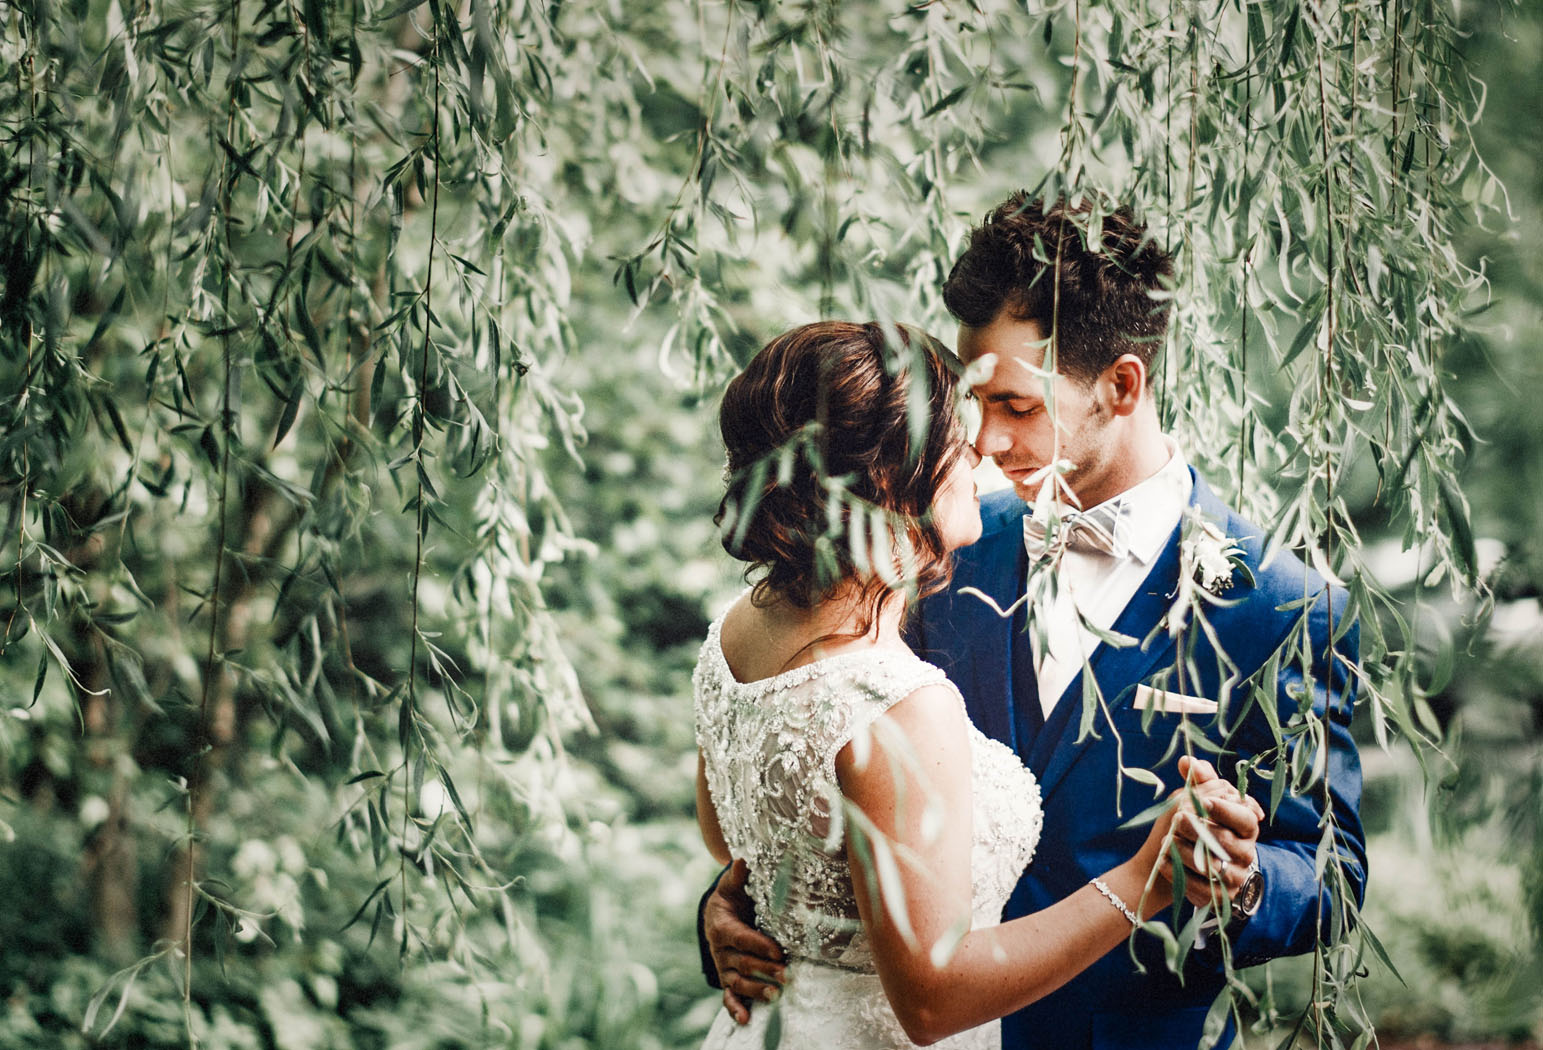 wedding-0006jpg_27059475642_o.jpg